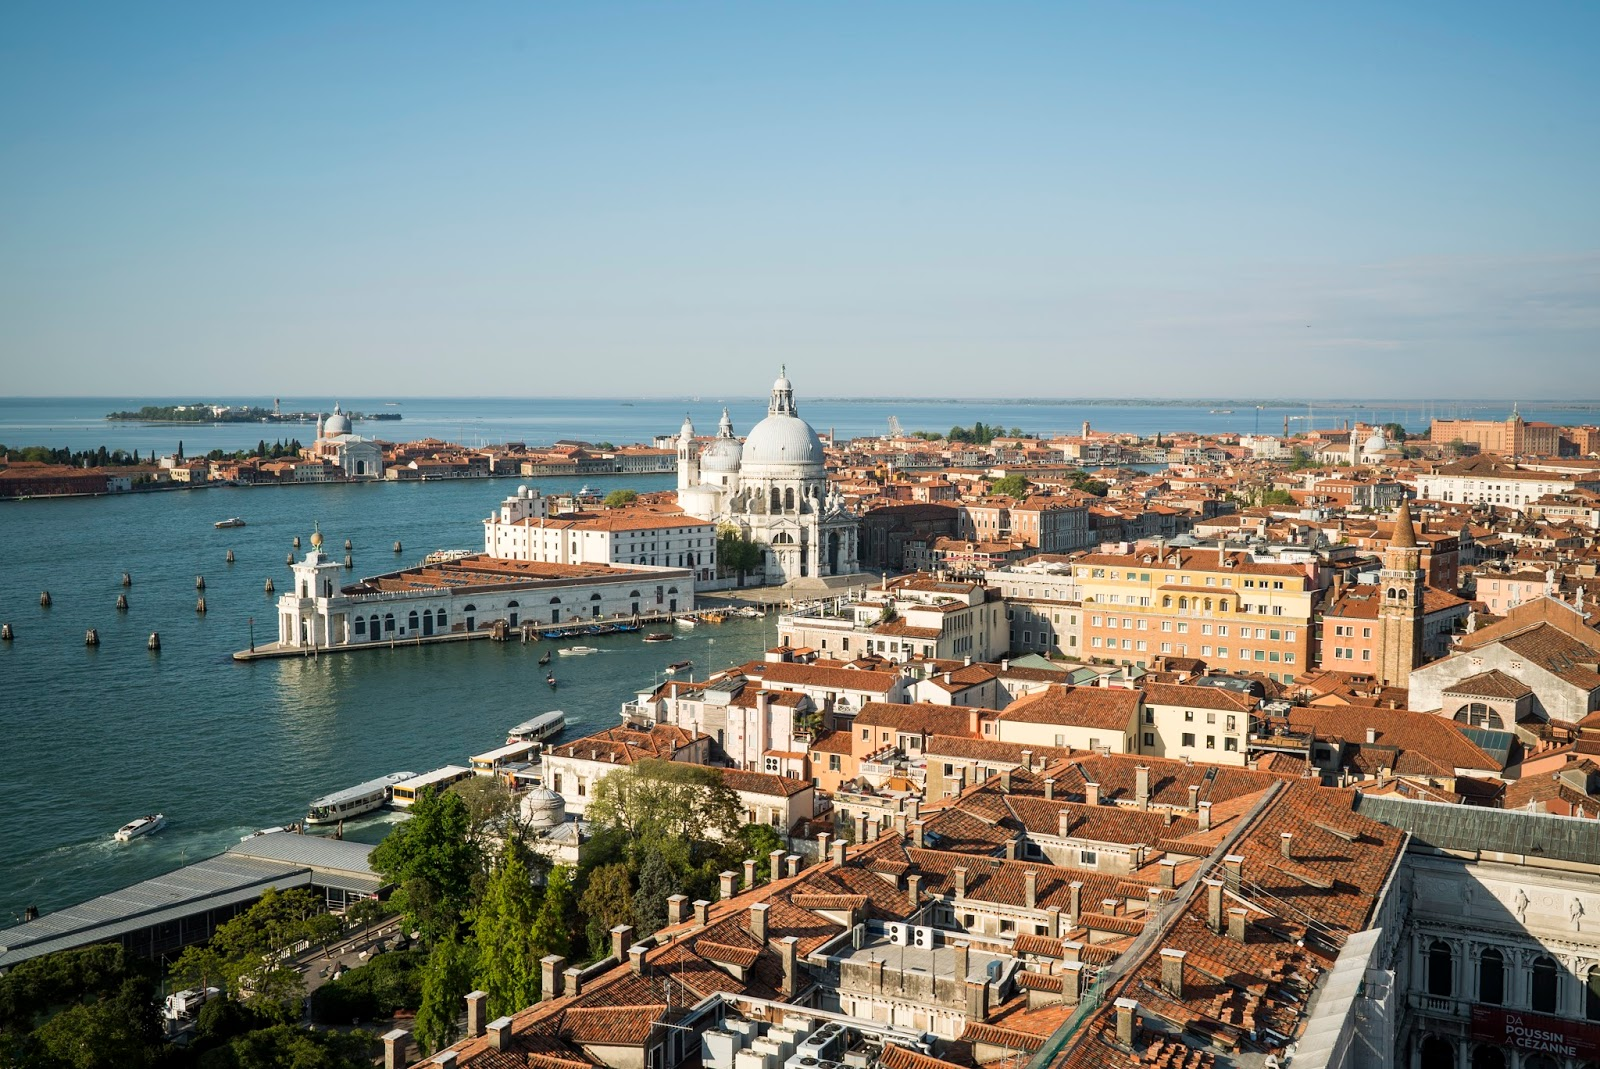 Campanile views of Venice 6-® EXHIBITION ON SCREEN (David Bickerstaff).jpg